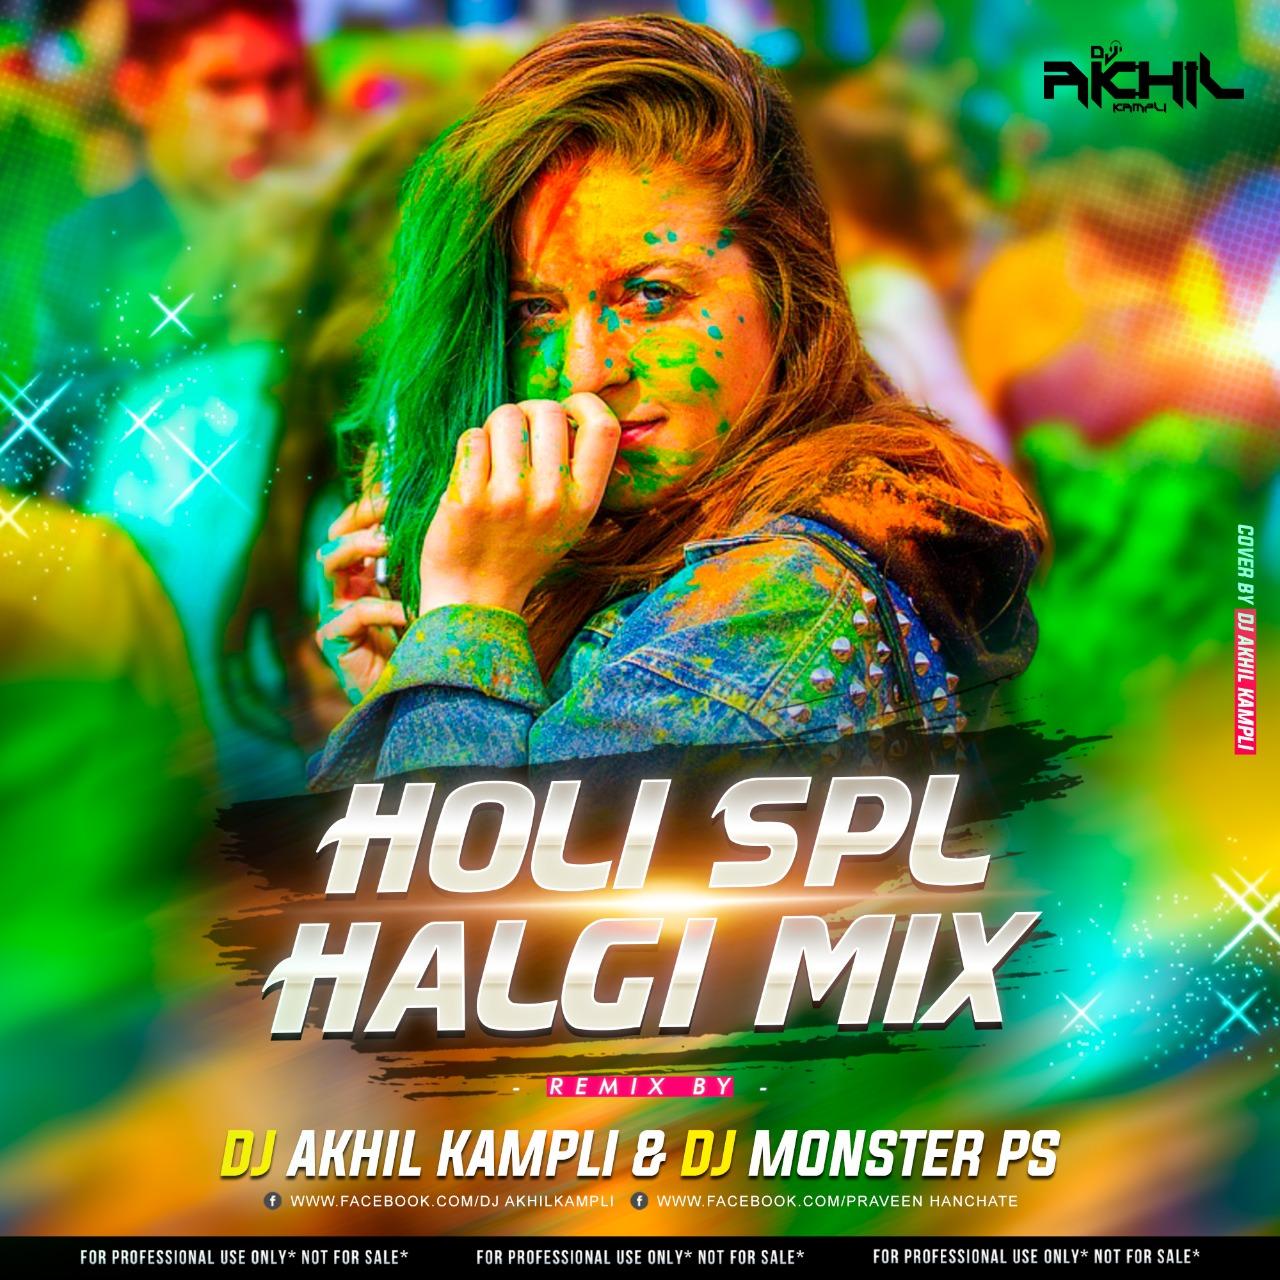 Holi Spl (Halgi Mix) Dj Akhil Kampli Dj Monster PS